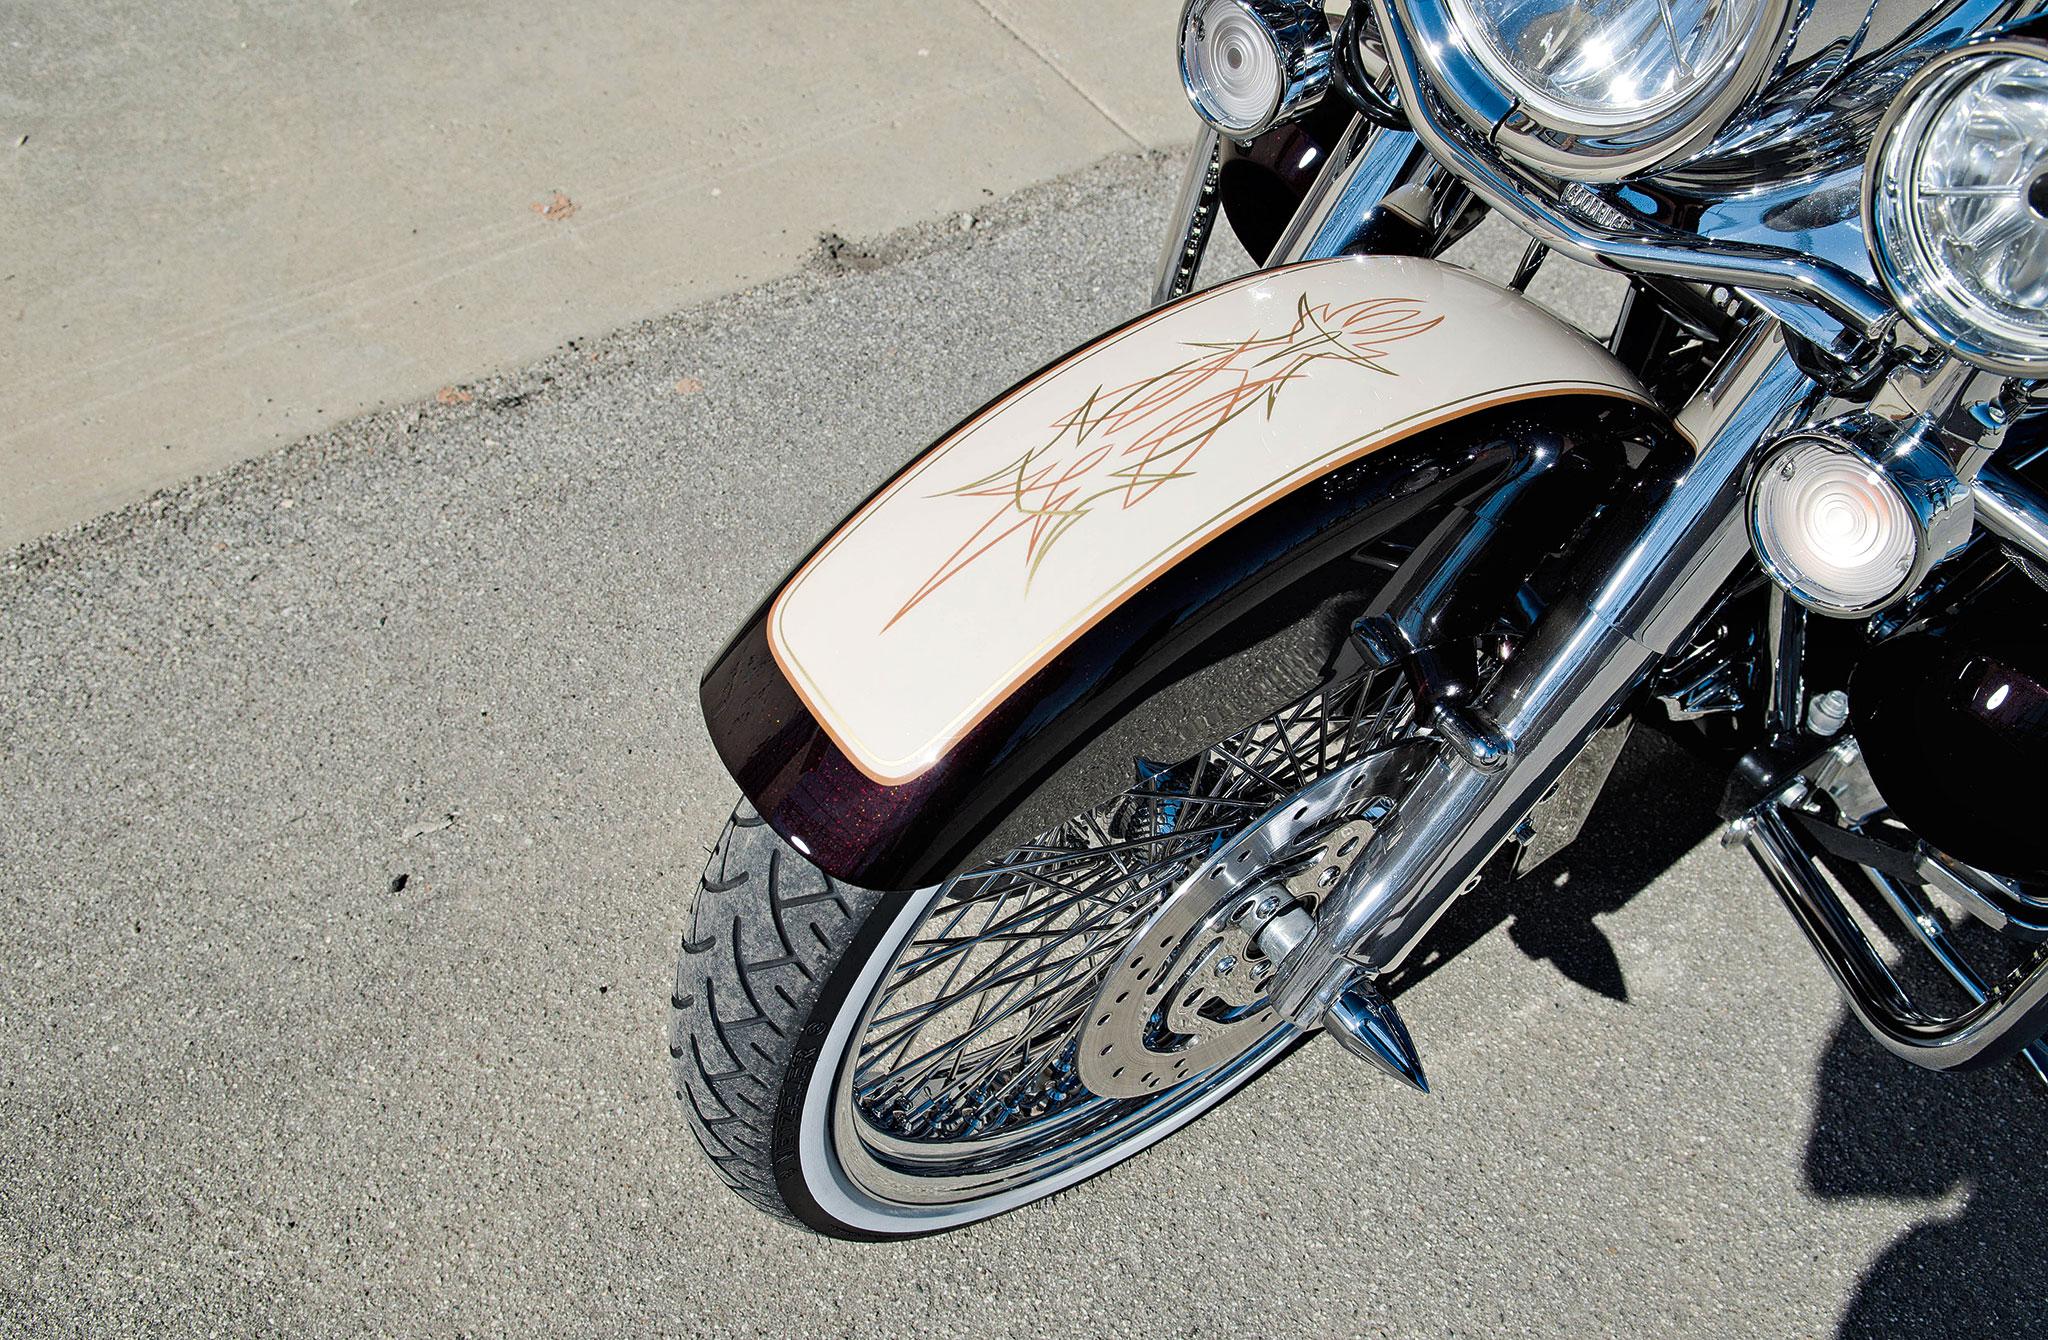 2002 Harley Davidson Road King - El Rey - Lowrider